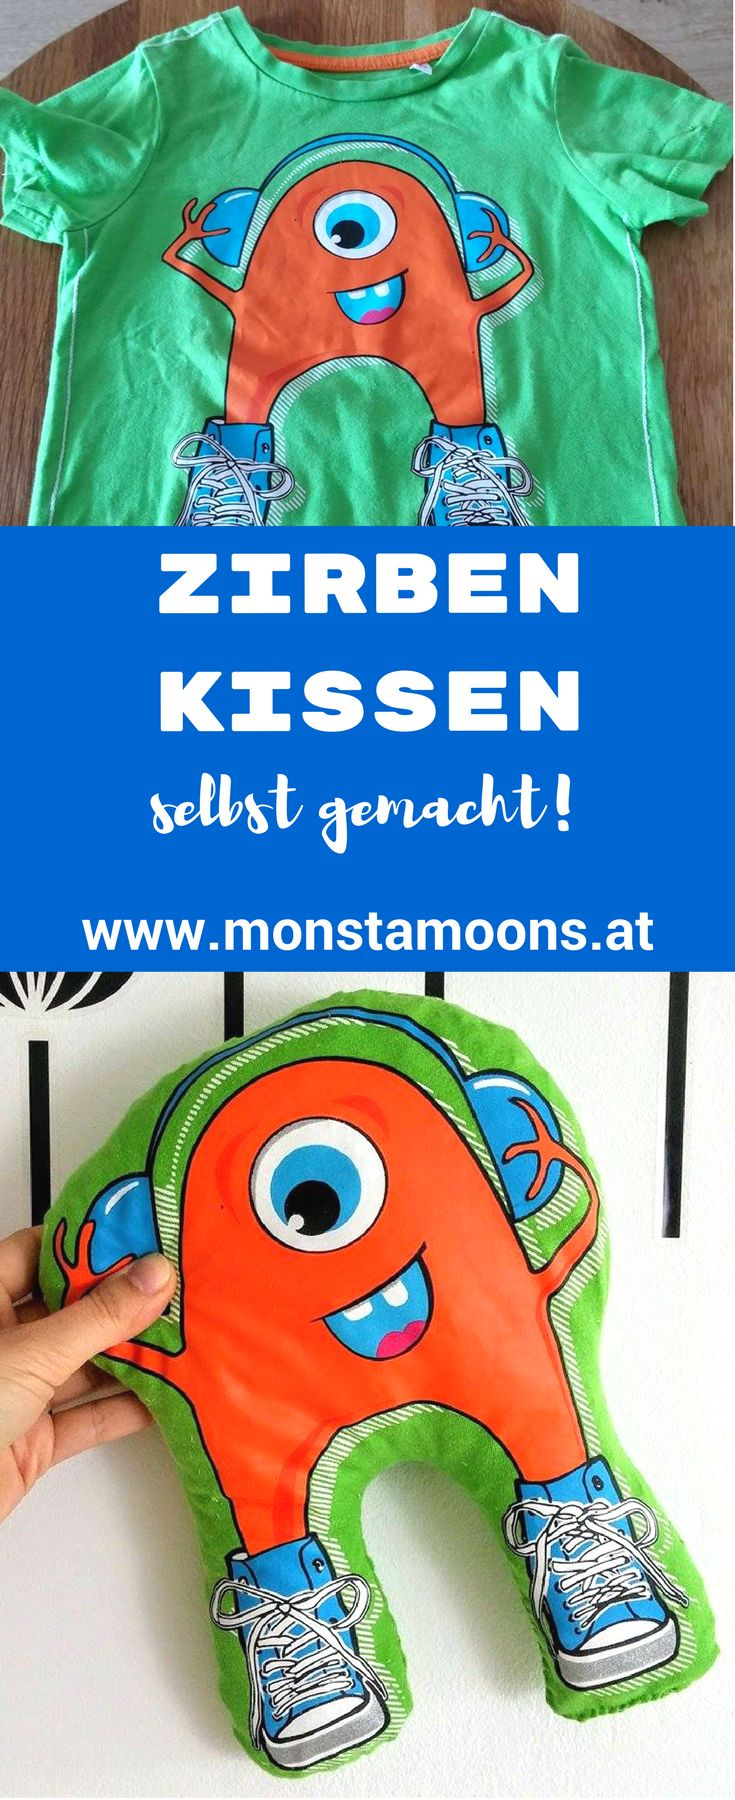 Zirbenkissen nähen, Kissen für Kids, T-Shirts upcyclen, shirt upcycling, Zirbenholz DIY